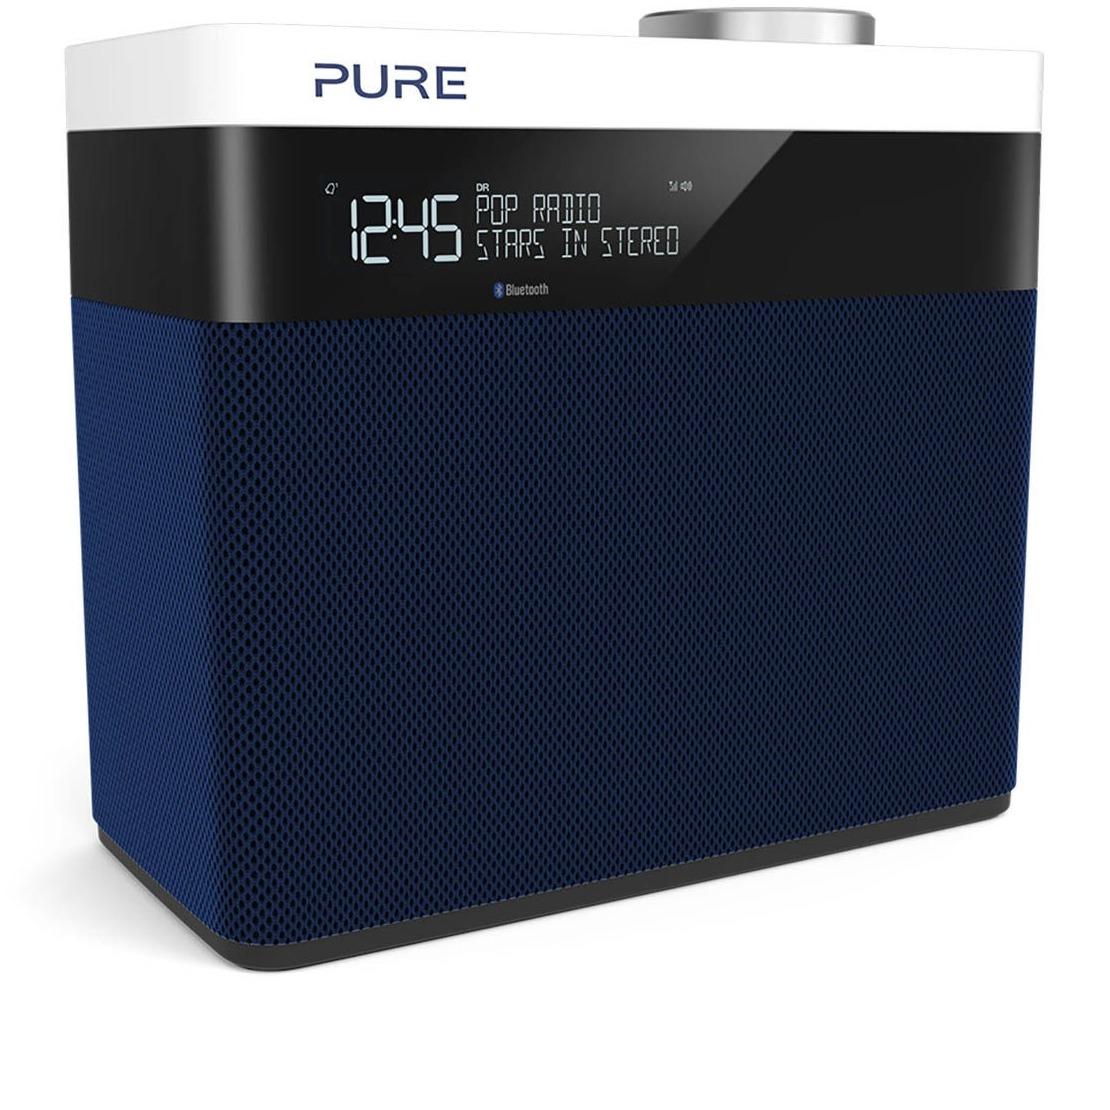 Pure dab radio Pop Maxi S donkerblauw